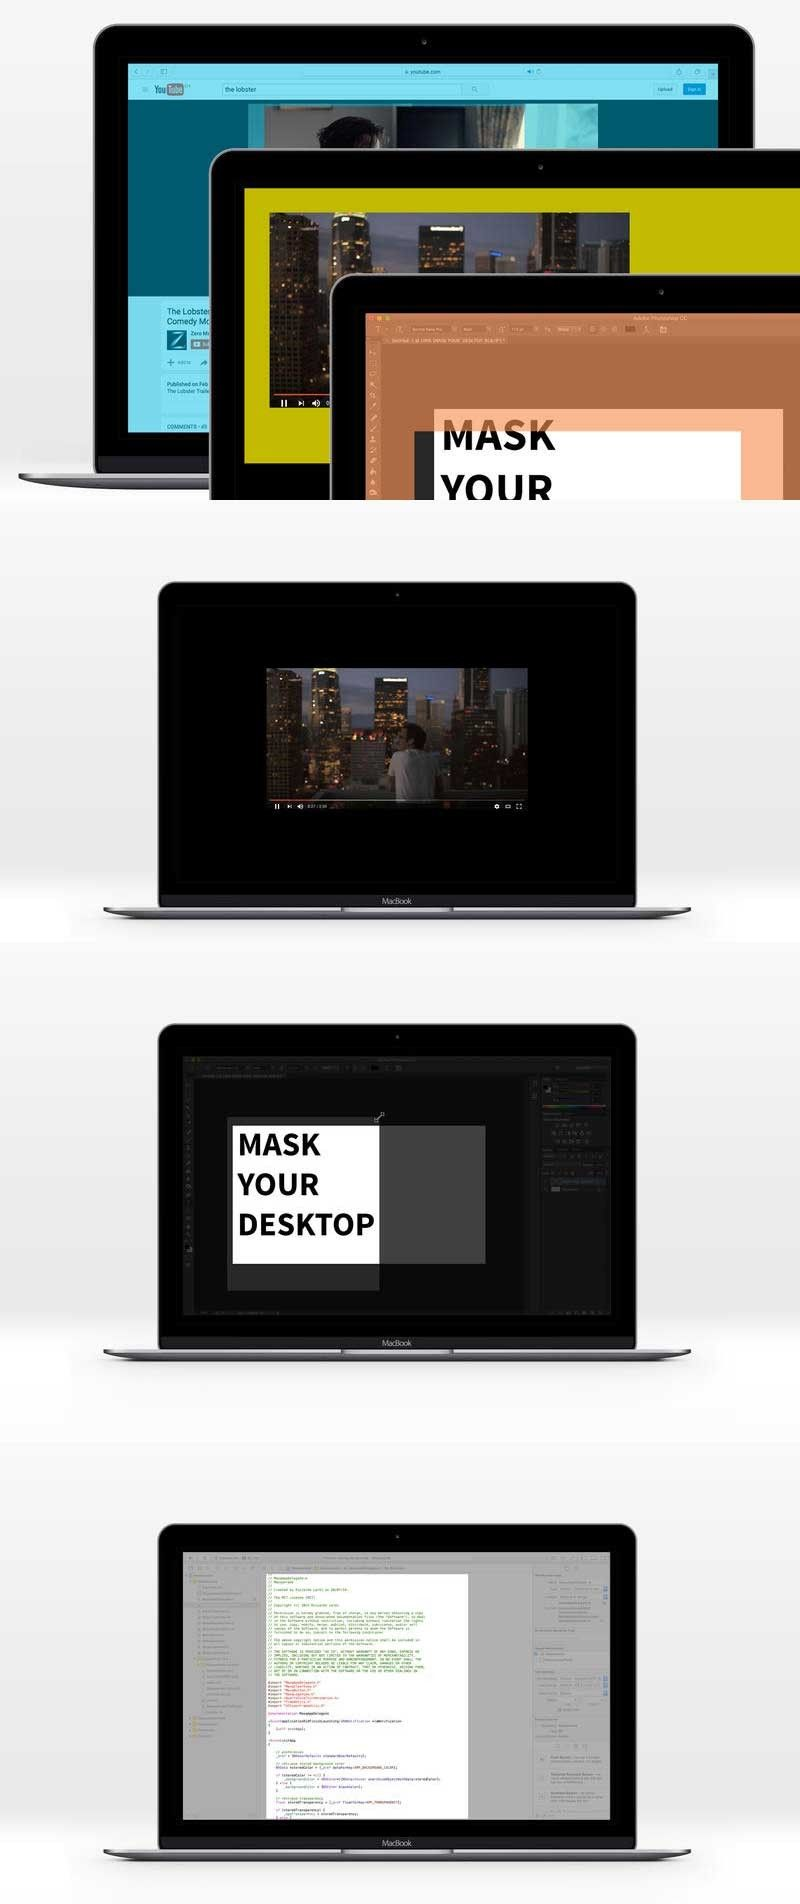 Masquerade 1.3.0 for Mac 破解版 覆盖部分桌面的工具 Mac application